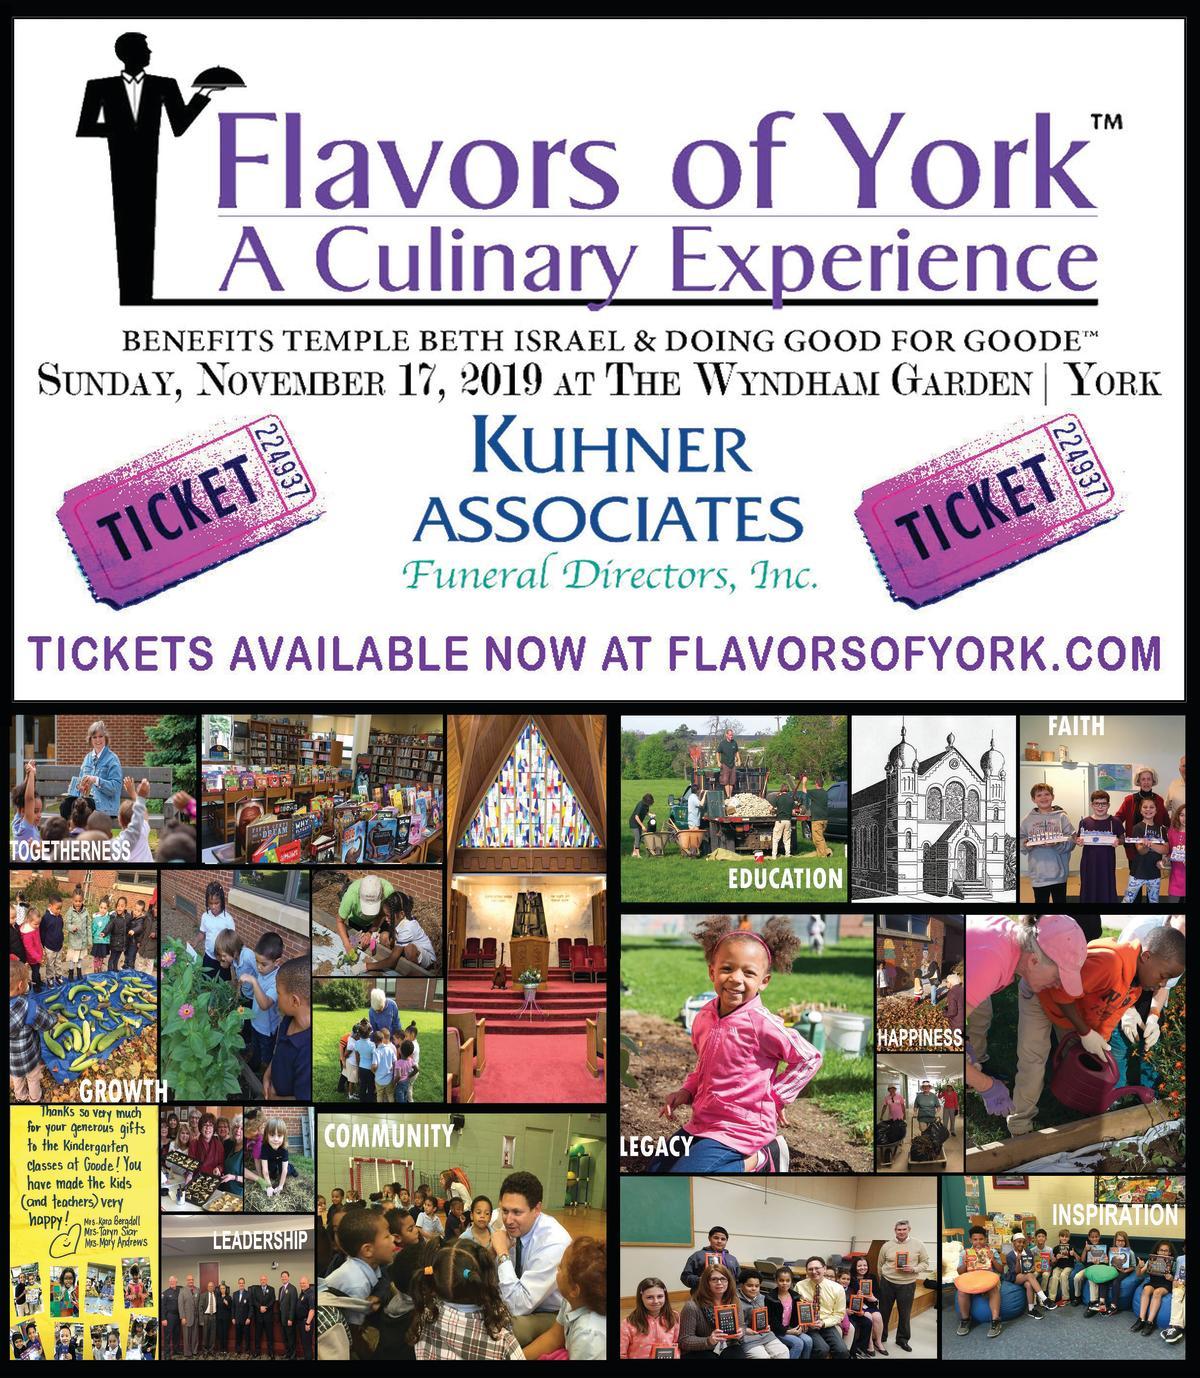 Flavors of York™ 2019